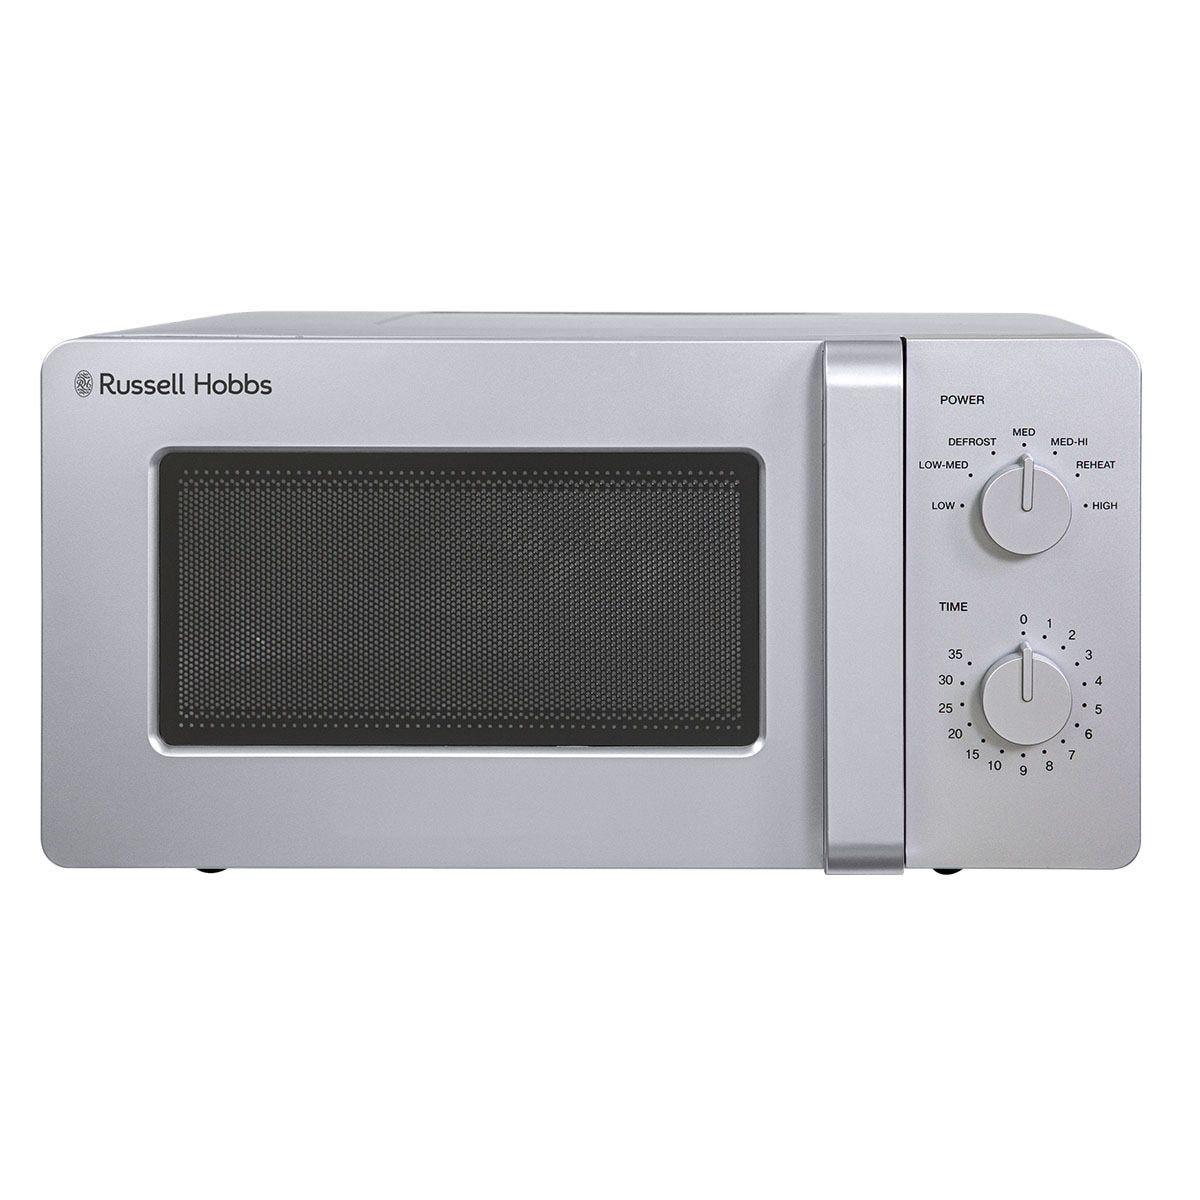 Russell Hobbs RHM1401S Ultra 600W 14L Manual Microwave - Silver